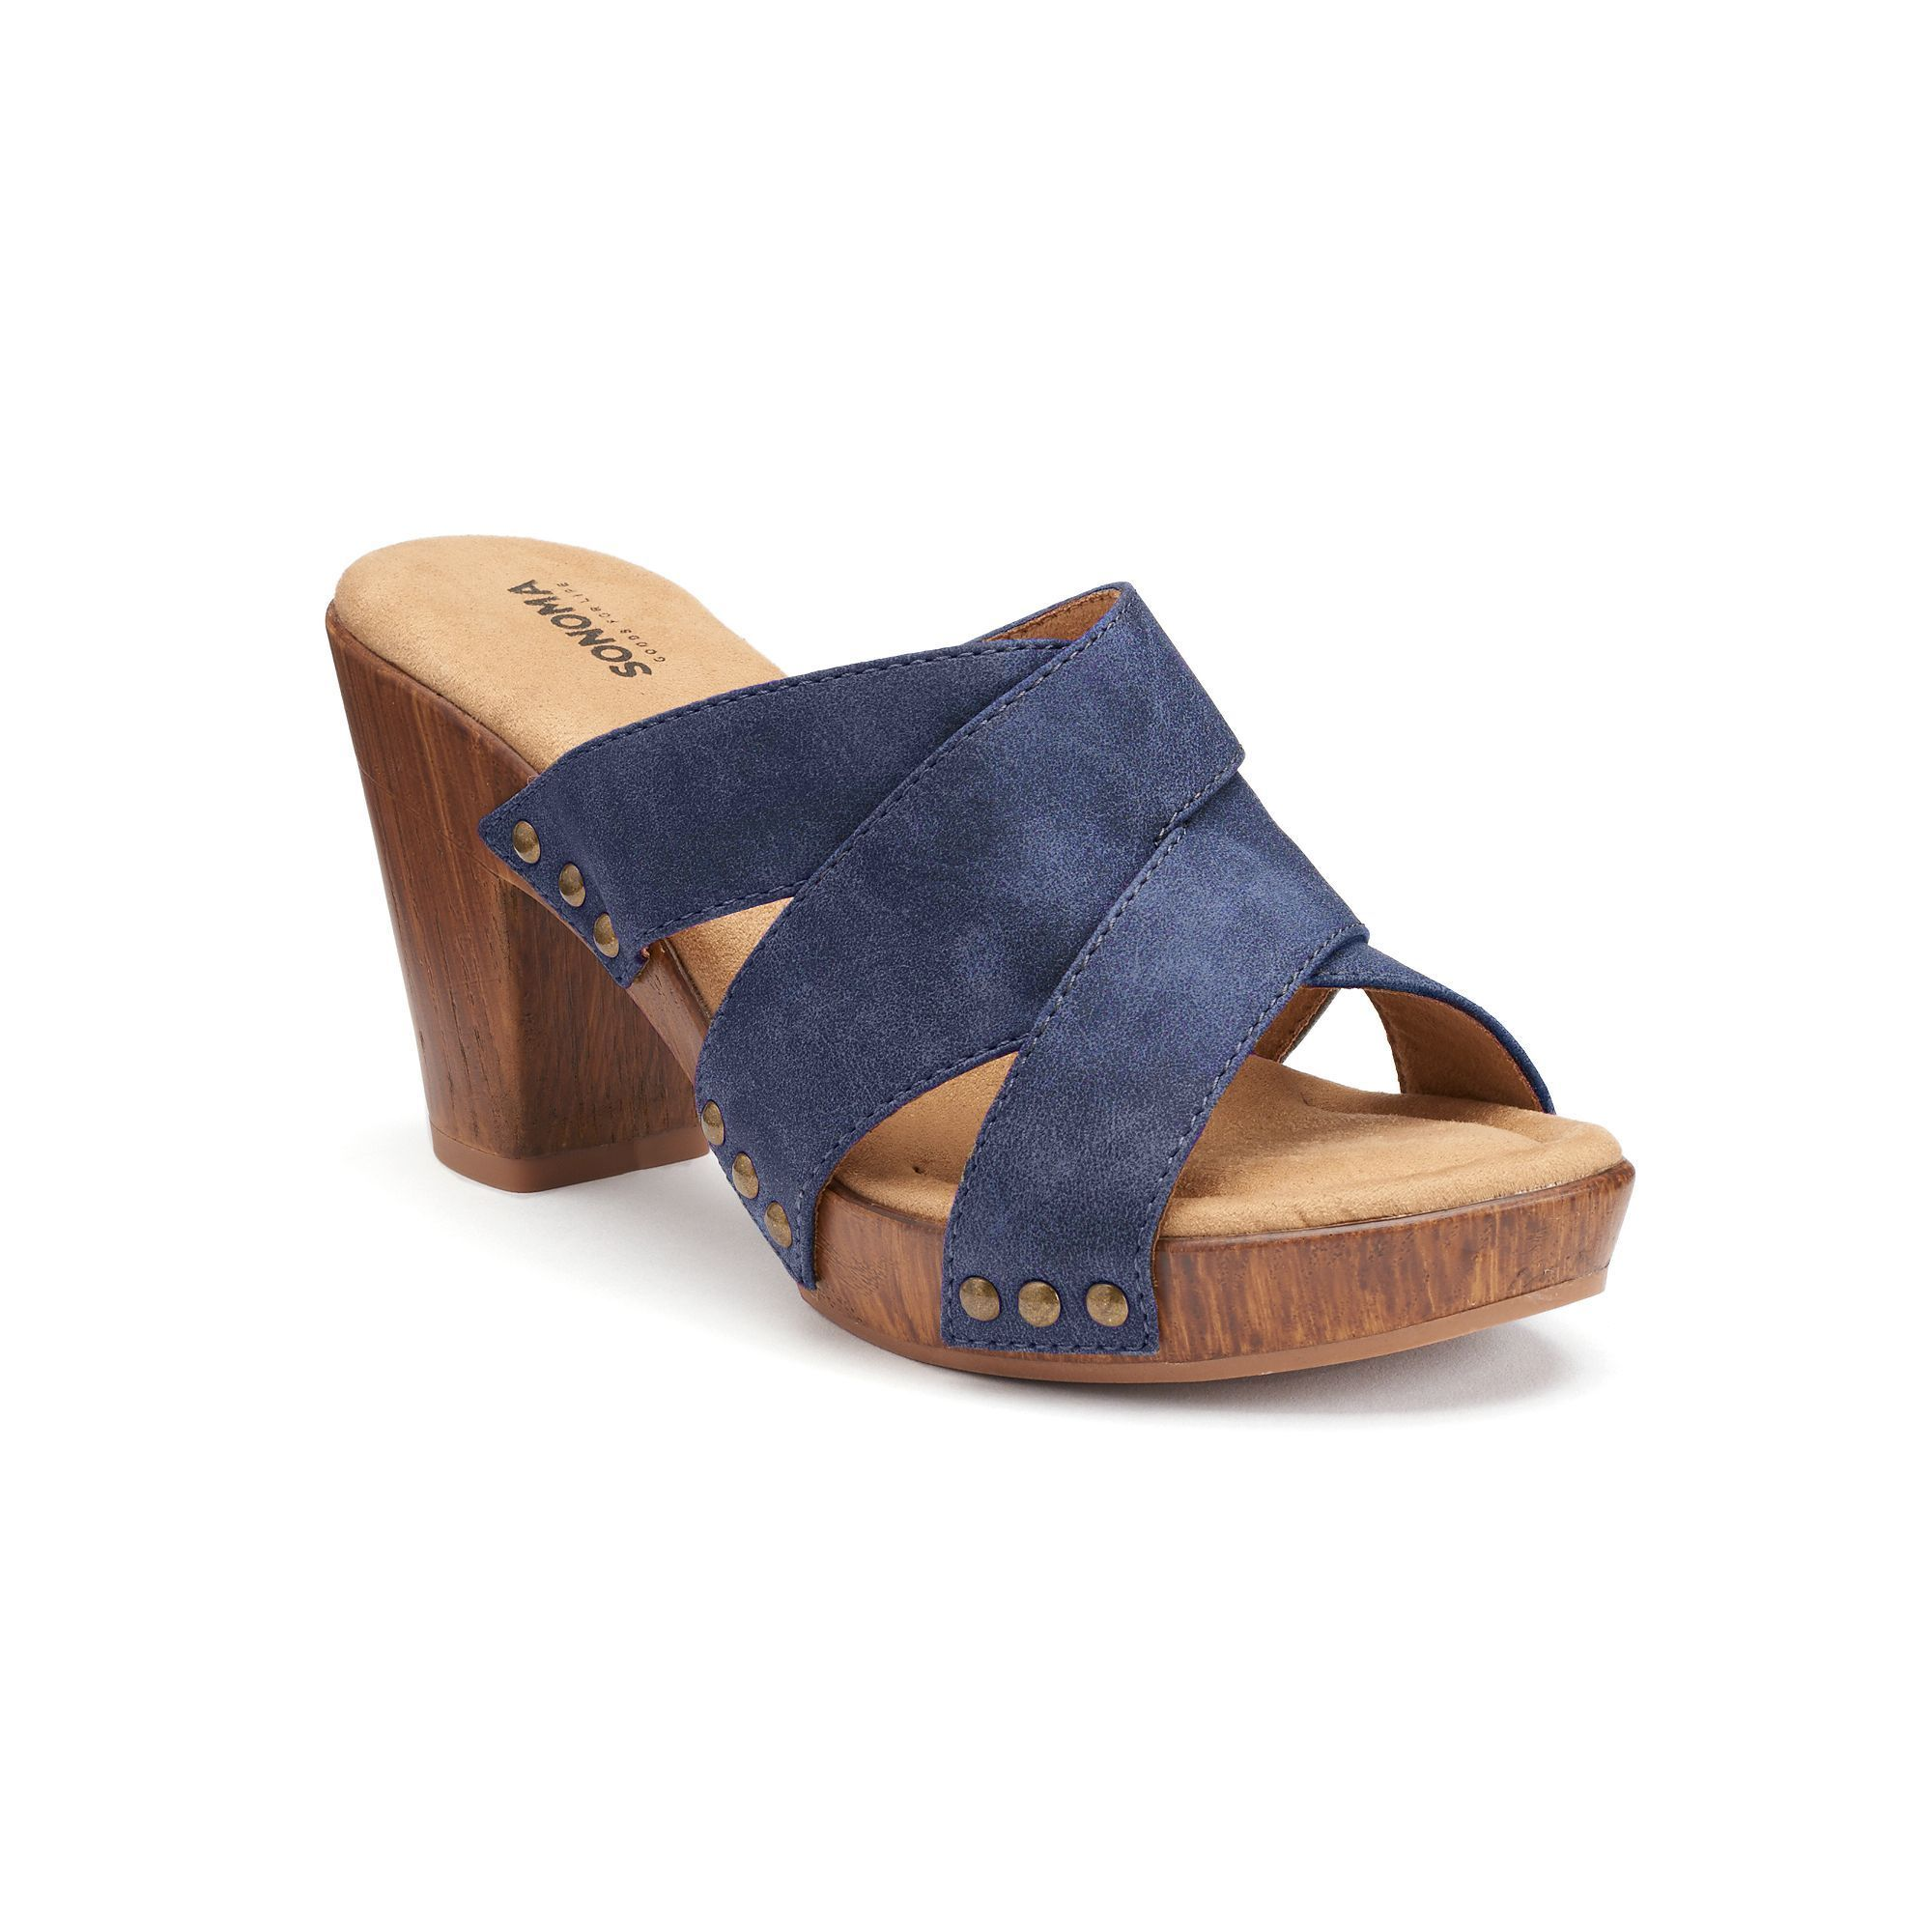 cc2fa470f54 SONOMA Goods for Life™ Eeva Women's Block-Heel Sandals   Products ...